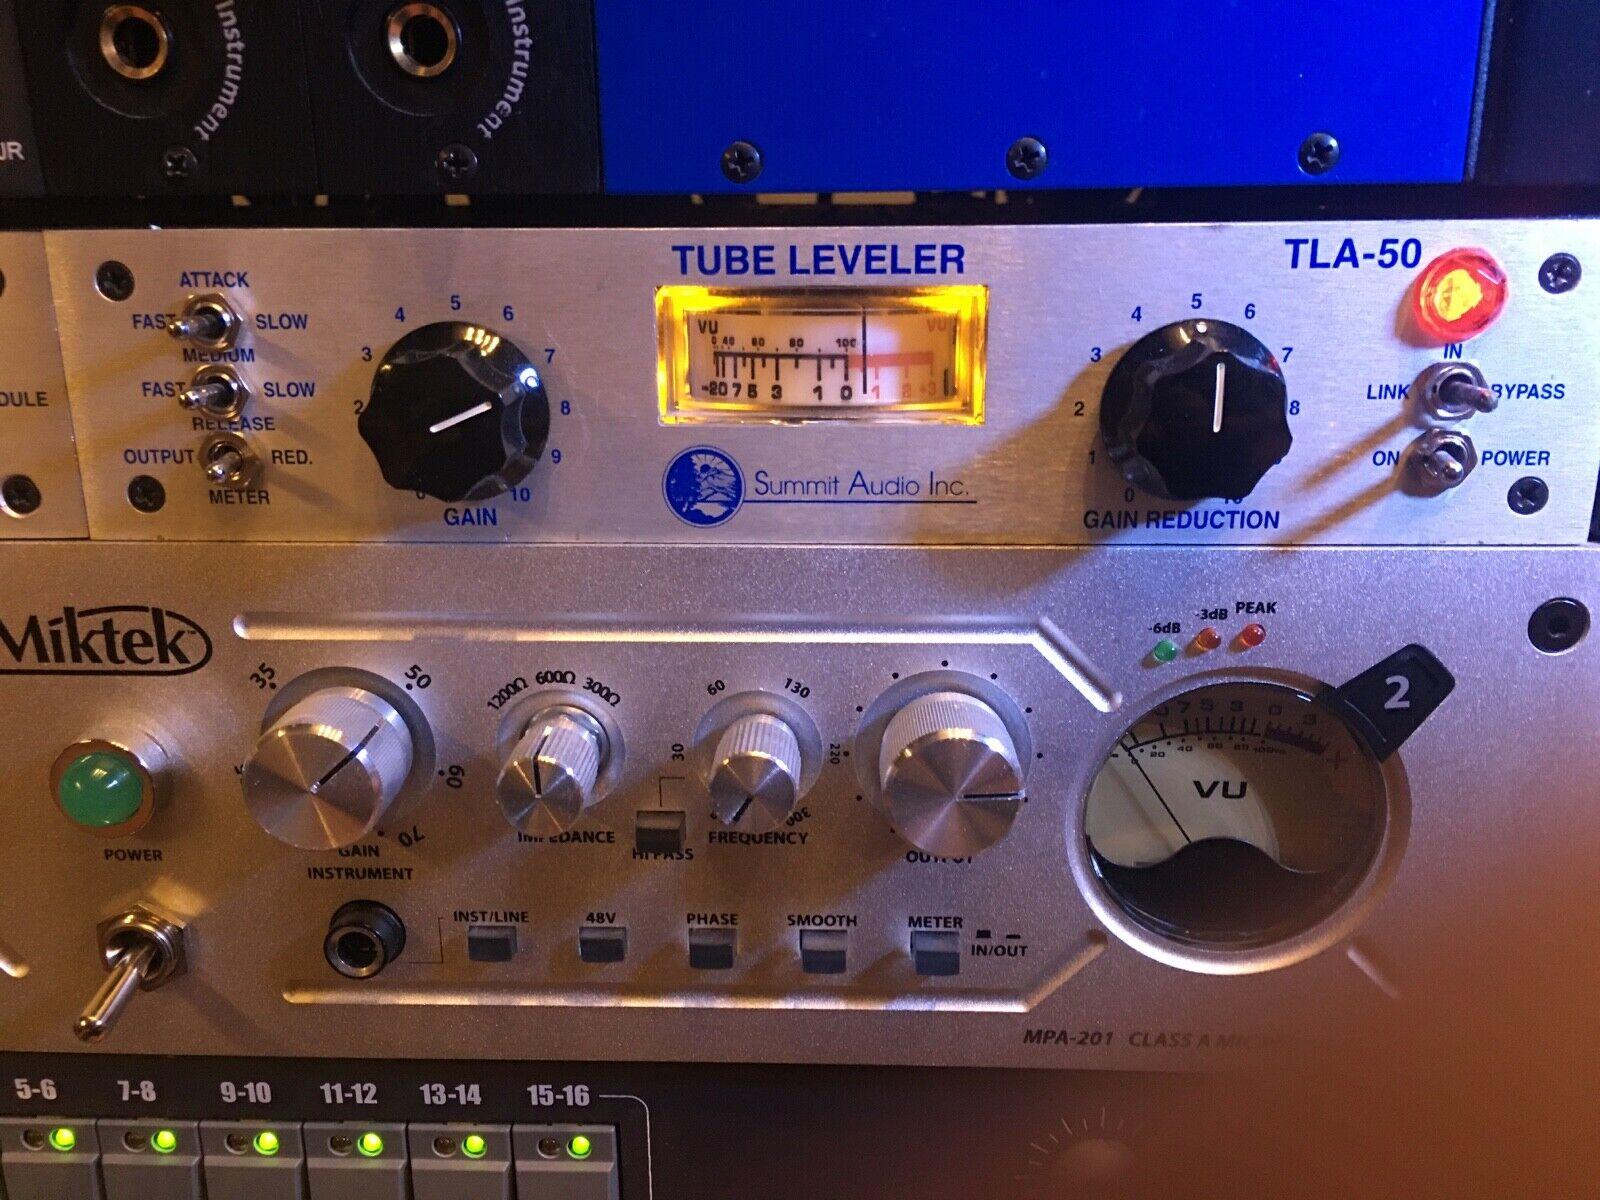 Summit Audio TLA-50 Tube Leveling Amplifier. Buy it now for 649.99